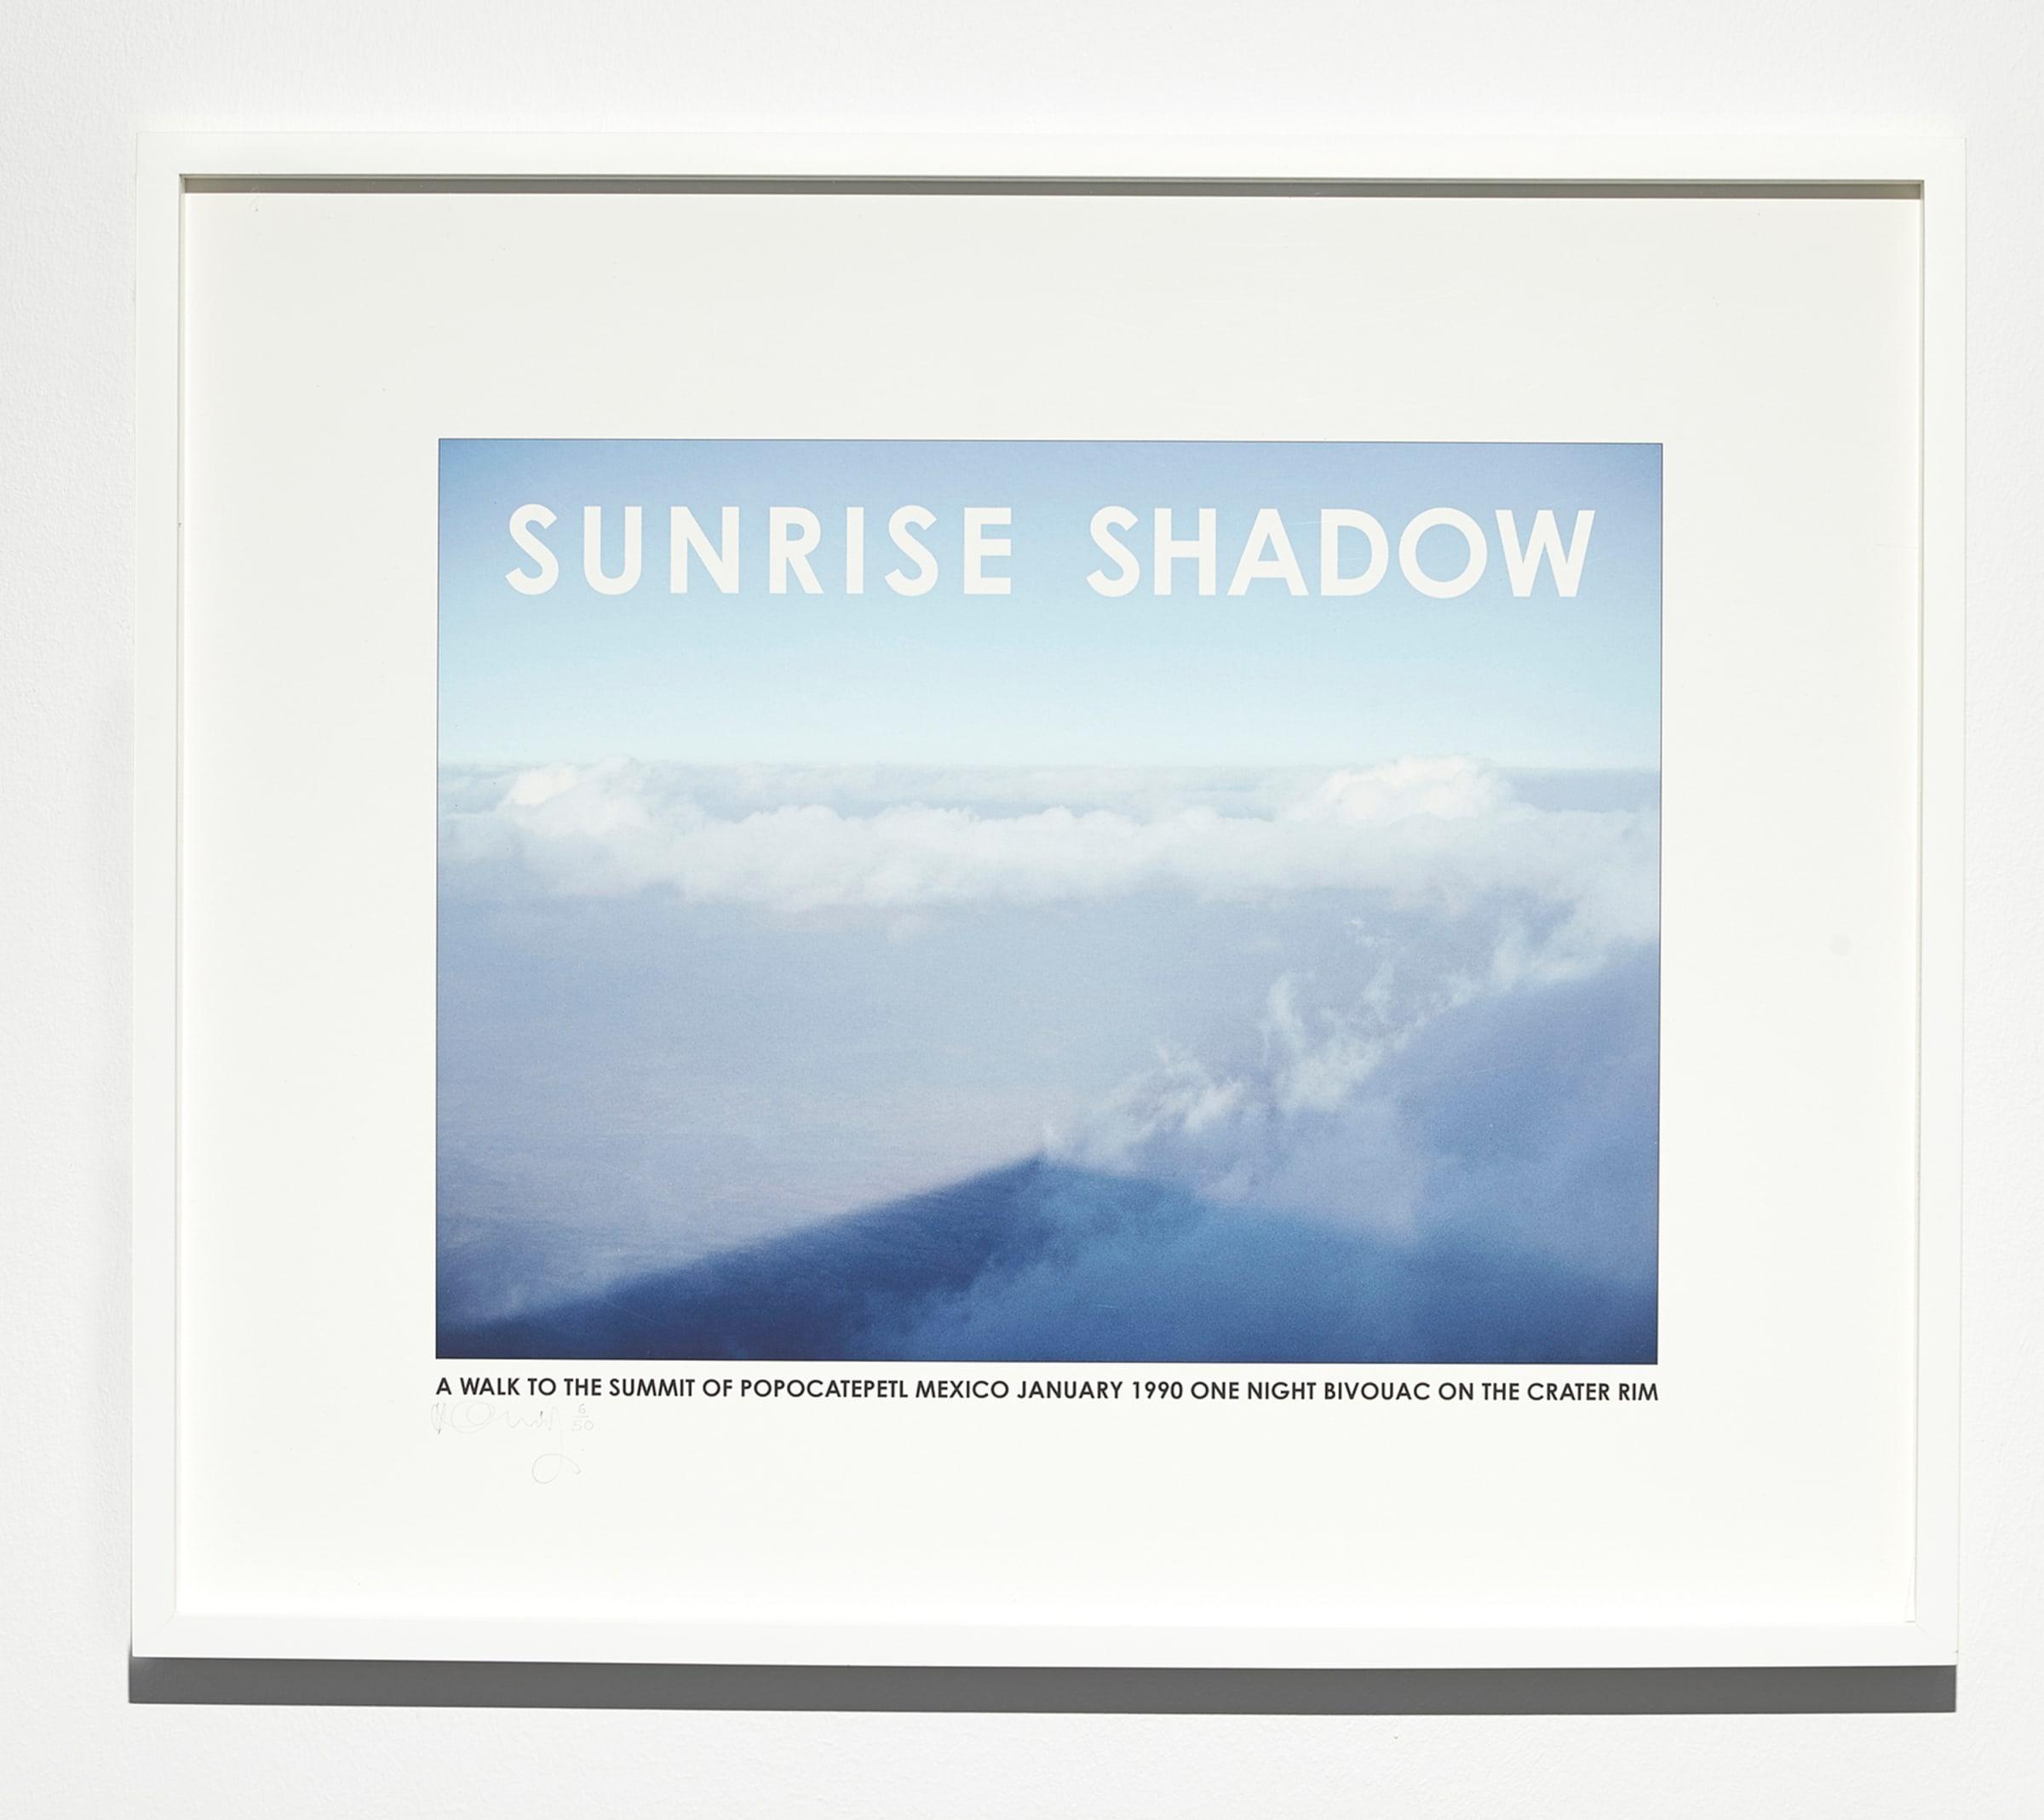 "<span class=""link fancybox-details-link""><a href=""/exhibitions/131/works/artworks9219/"">View Detail Page</a></span><div class=""artist""><strong>HAMISH FULTON</strong></div><div class=""title""><em>Sunrise Shadow Mexico</em>, 1990</div><div class=""medium"">print</div><div class=""dimensions"">44.8 x 53.7 x 4.0 cm<br>17 1/4 x 21 x 1 3/16 in</div><div class=""edition_details"">6/50</div>"